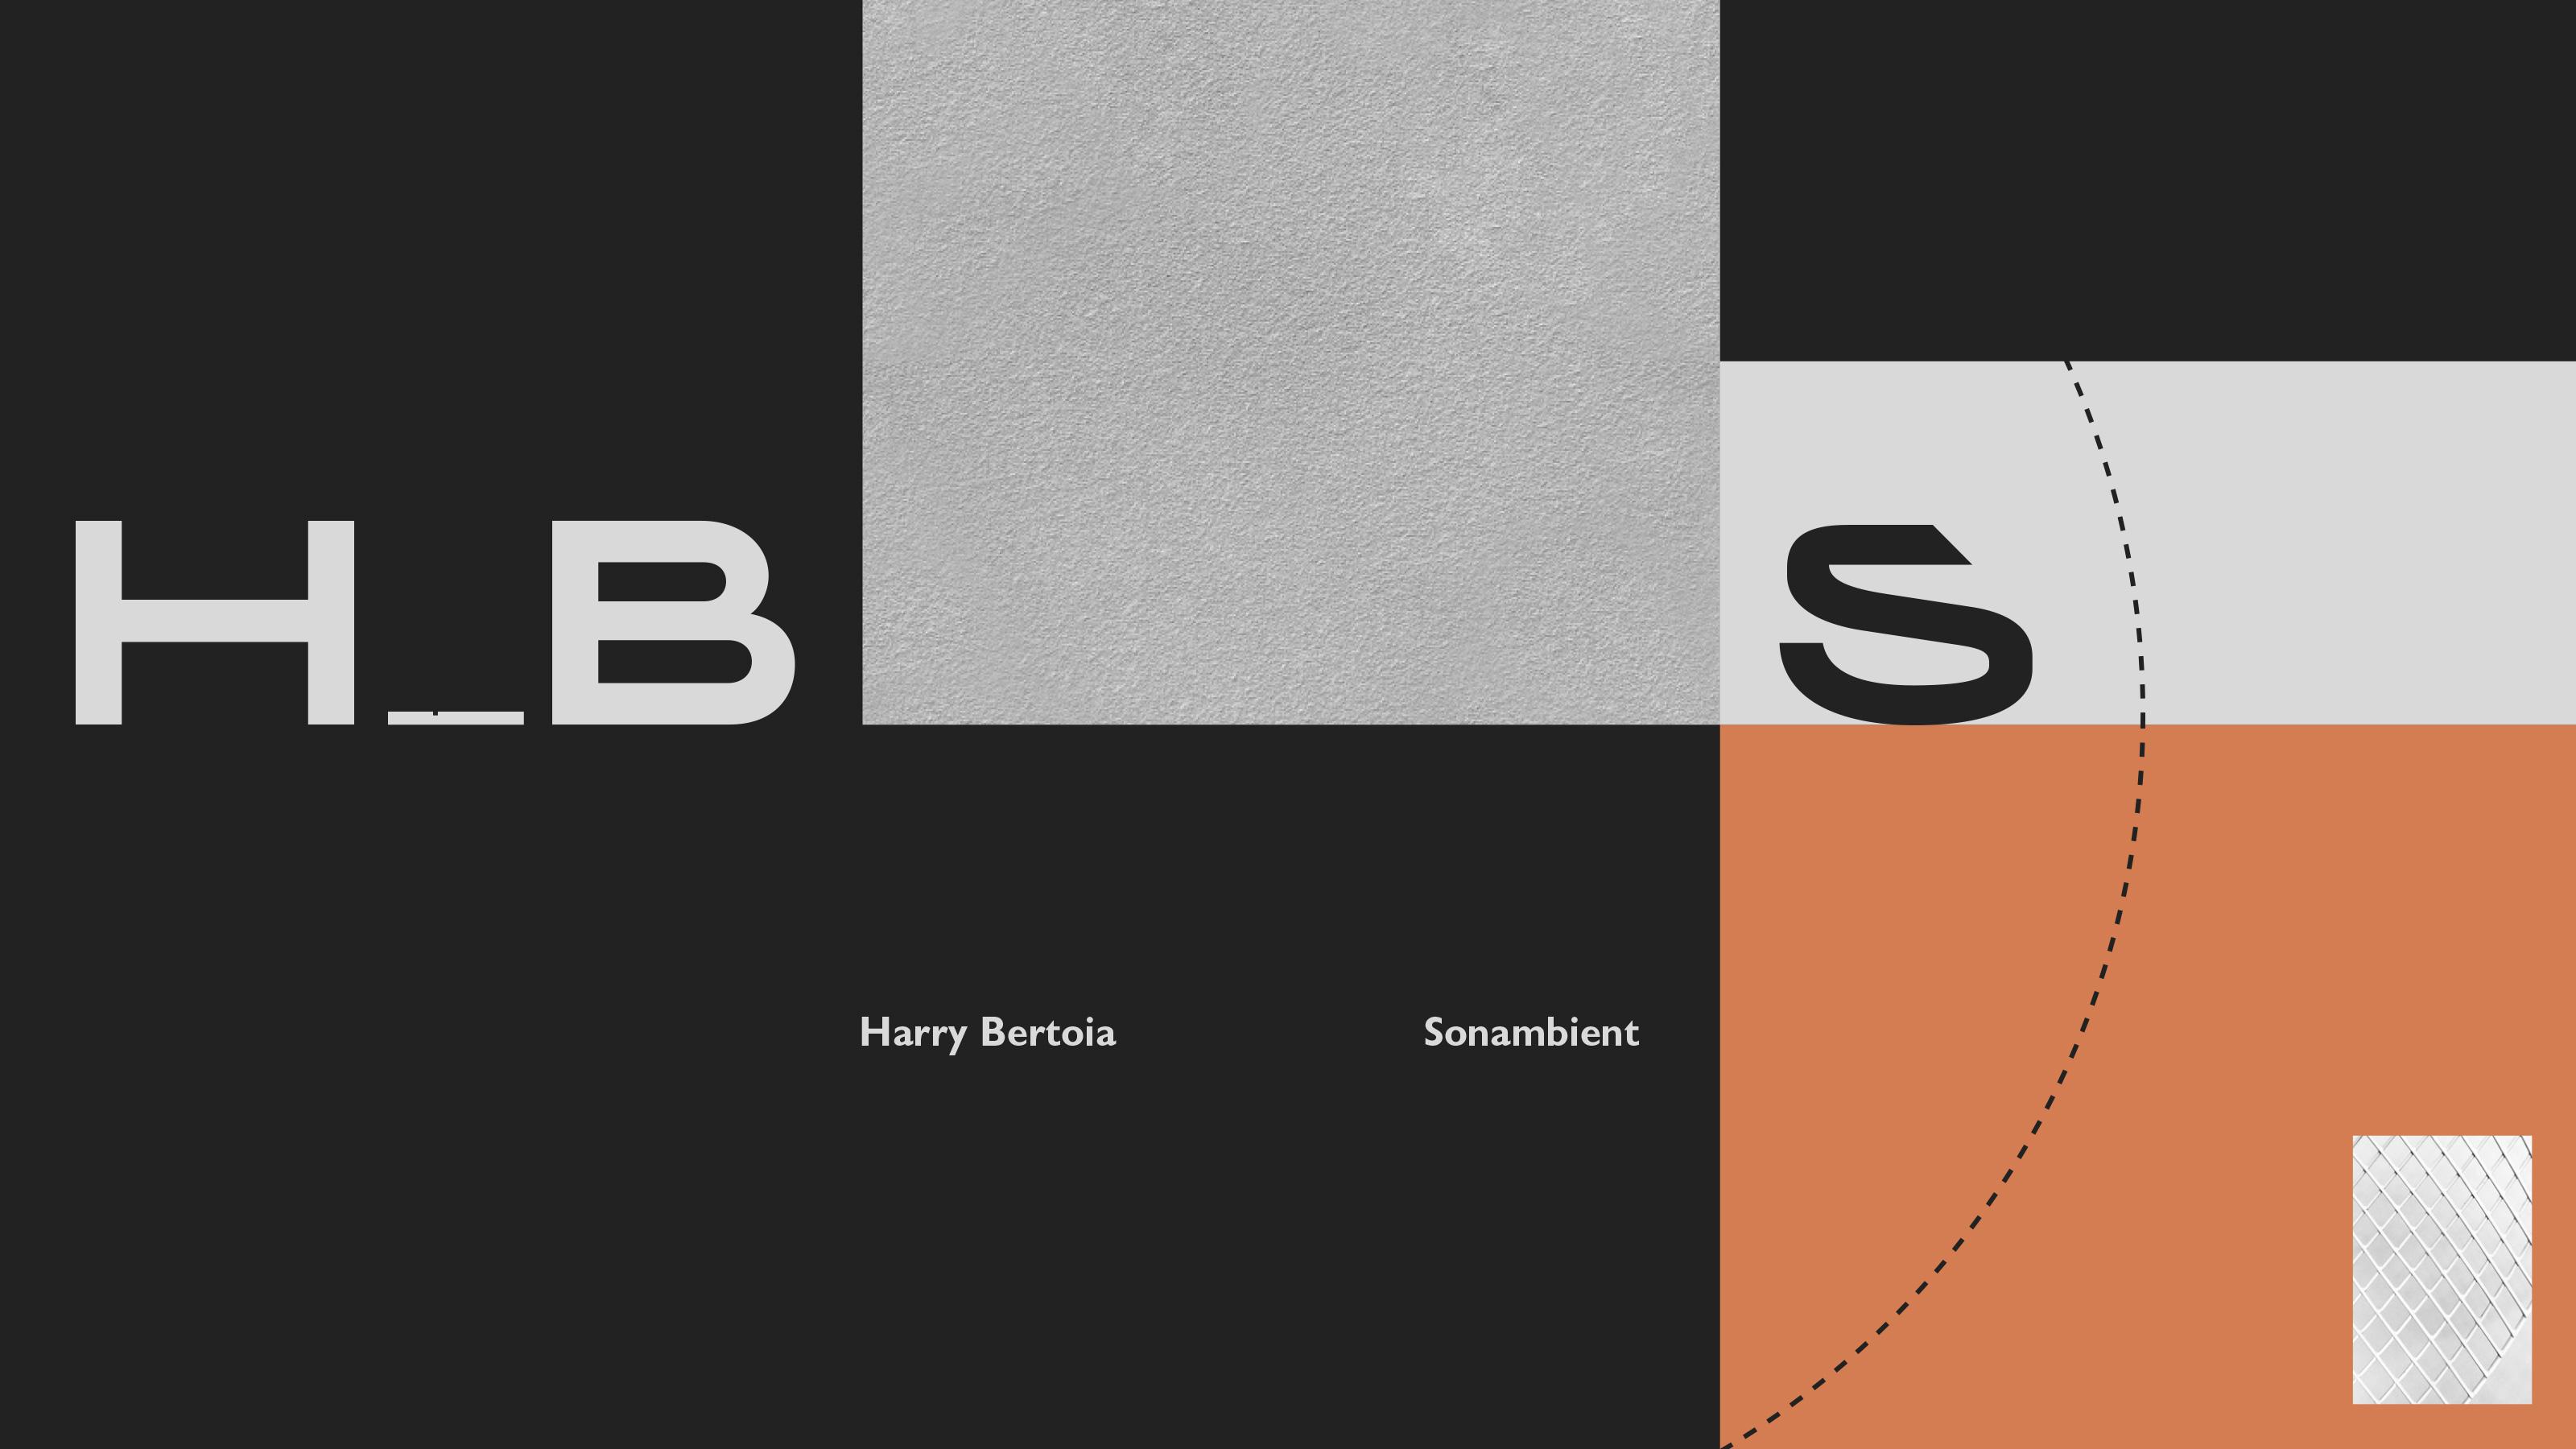 Harry Bertoia: Sonambient